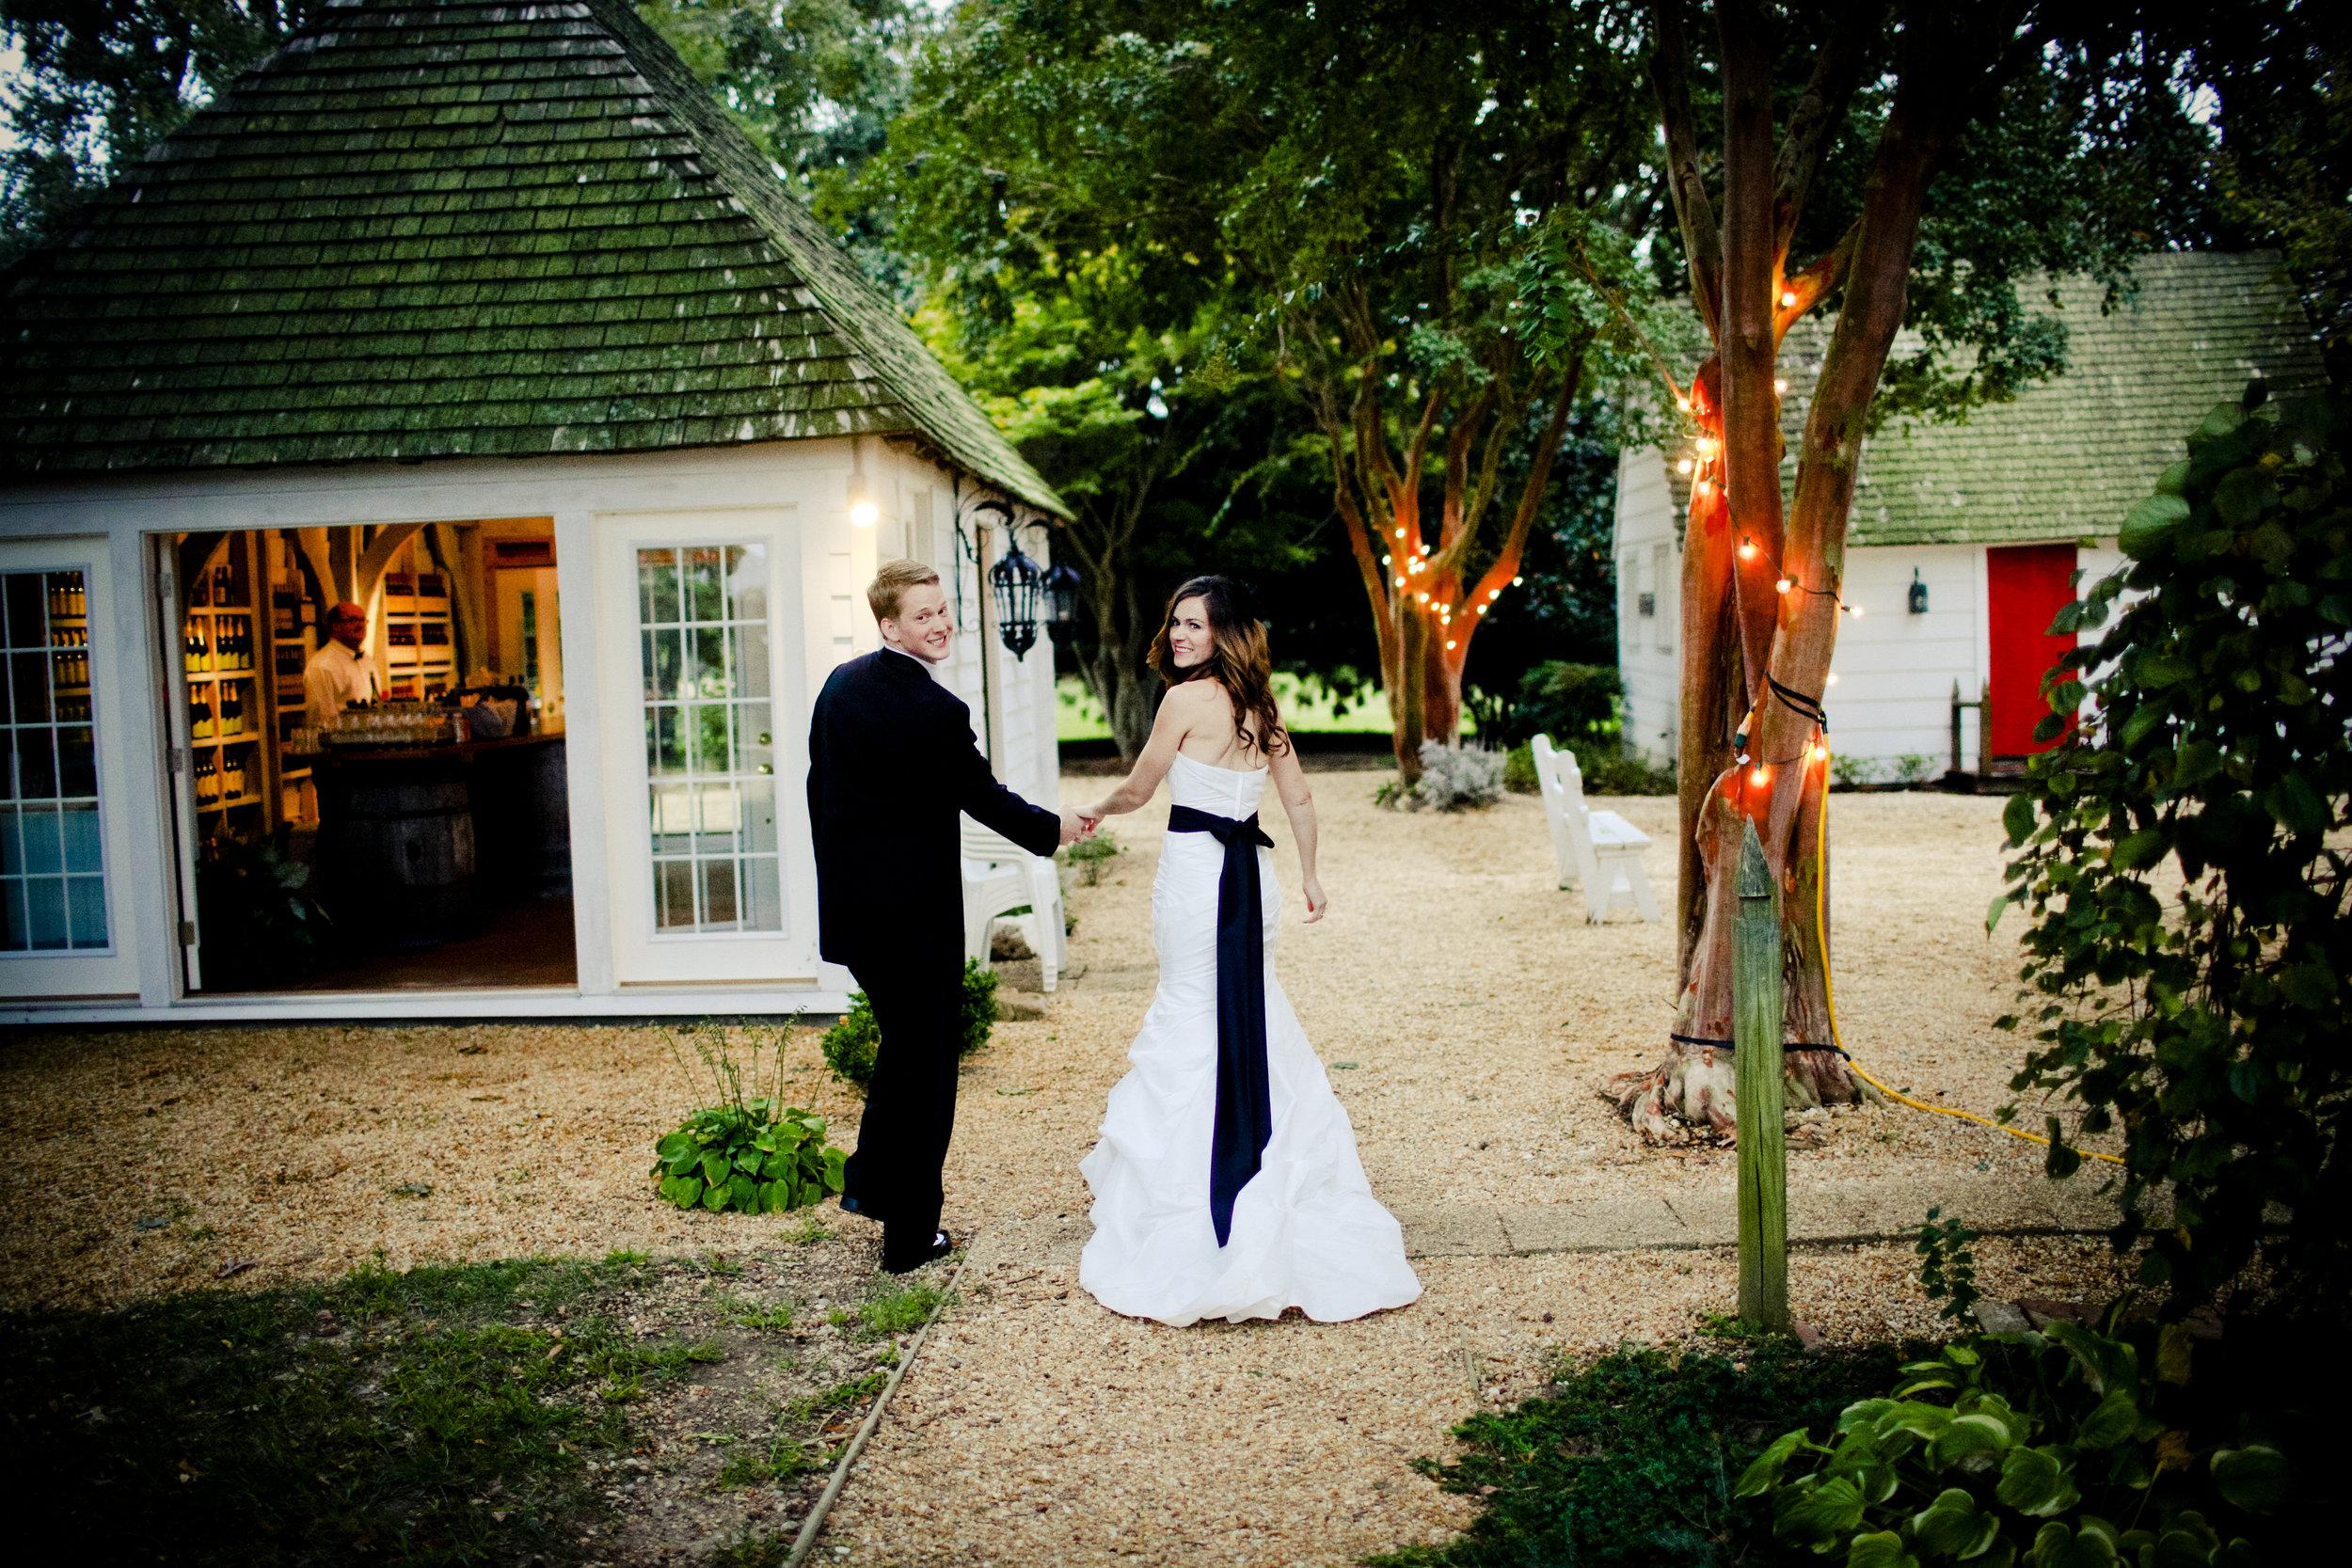 0020_100712 146 metcalf wedding edited.JPG